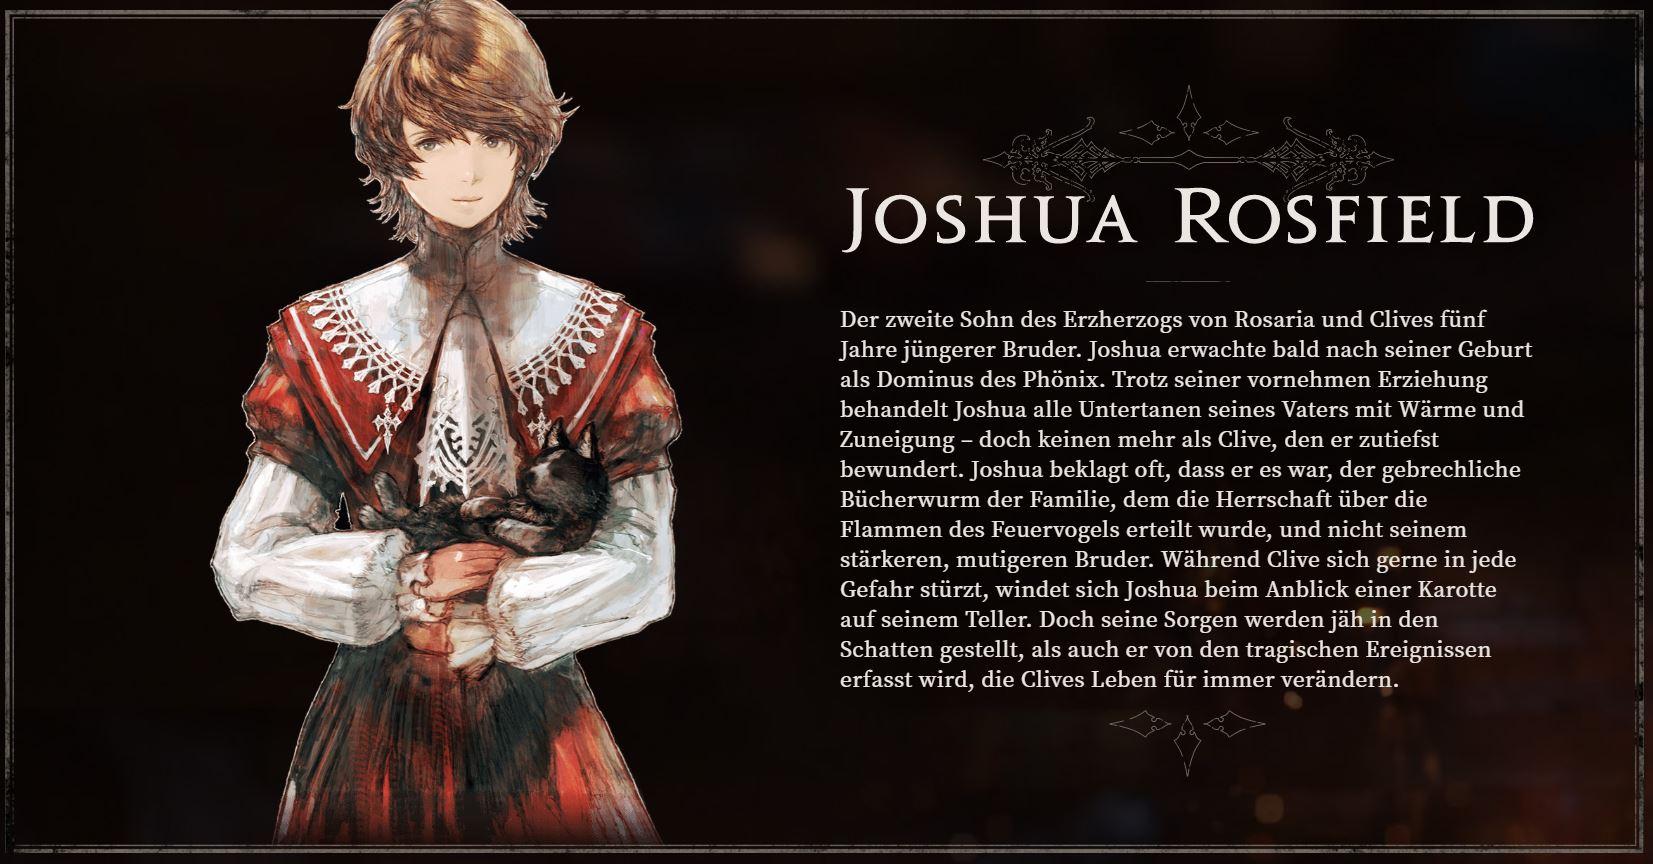 Joshua Risfield